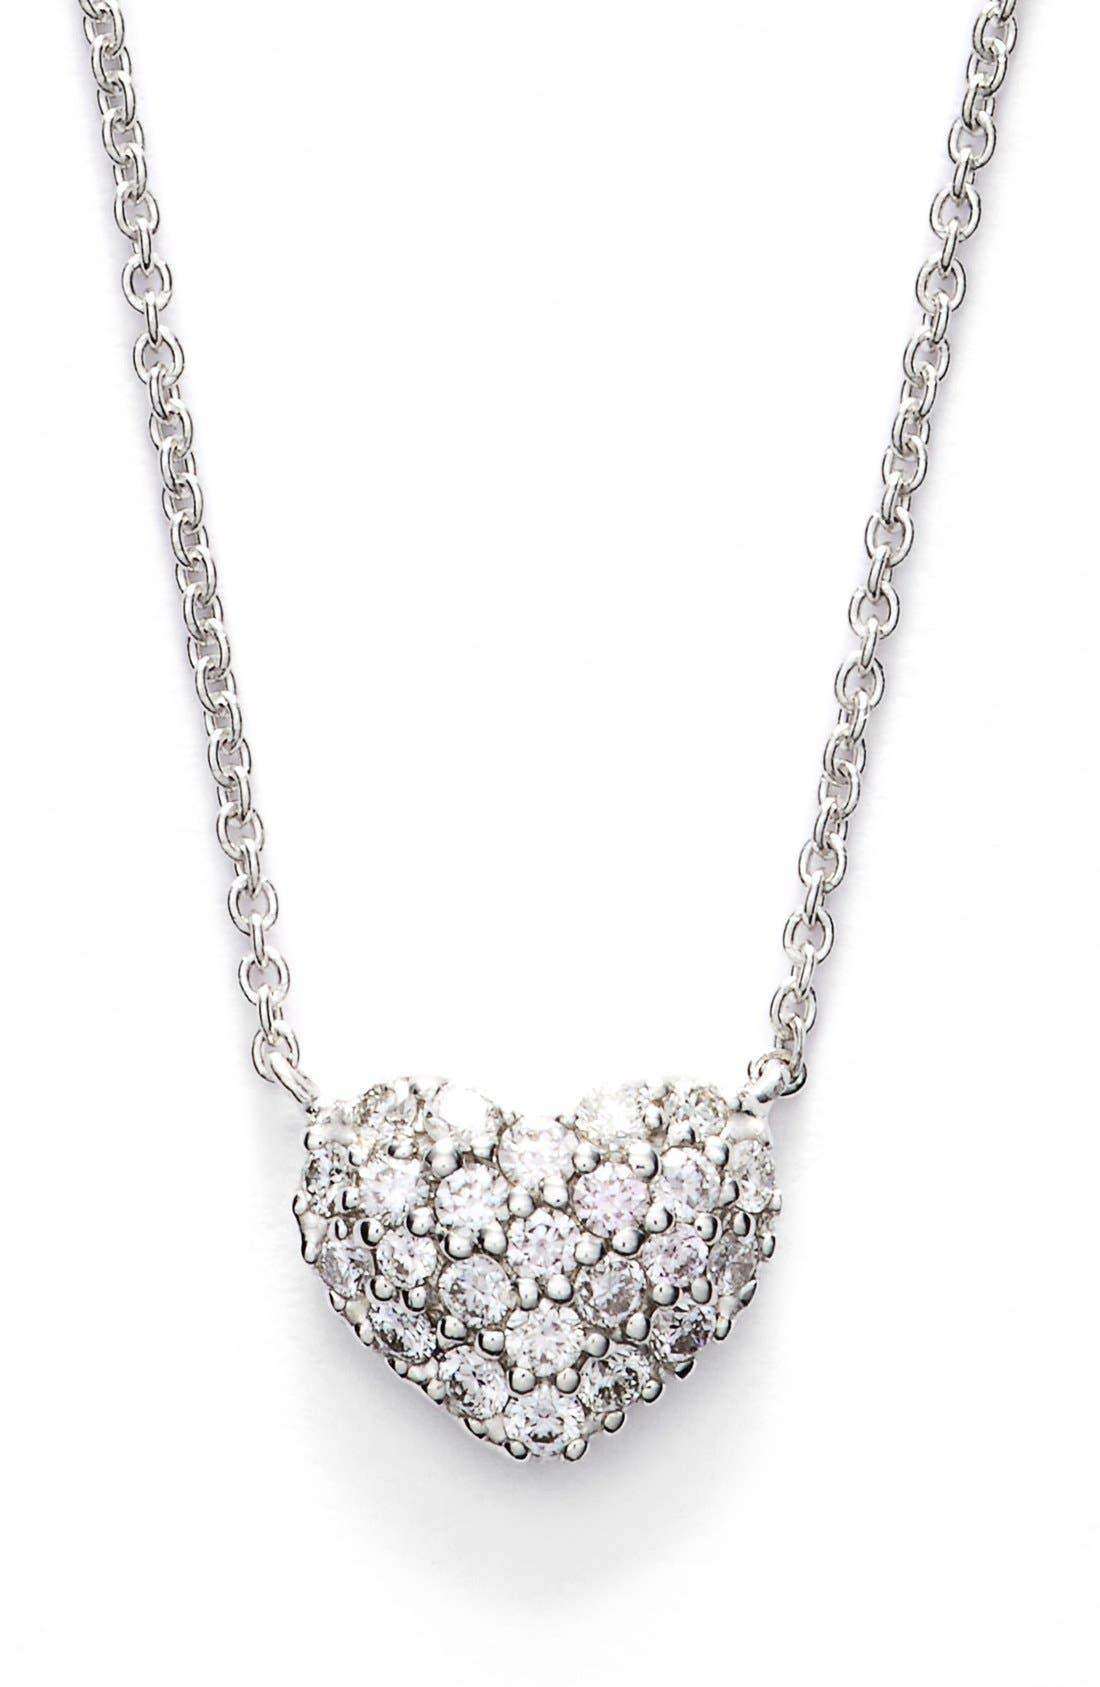 Main Image - Bony Levy Diamond Pavé Heart Pendant Necklace (Limited Edition) (Nordstrom Exclusive)